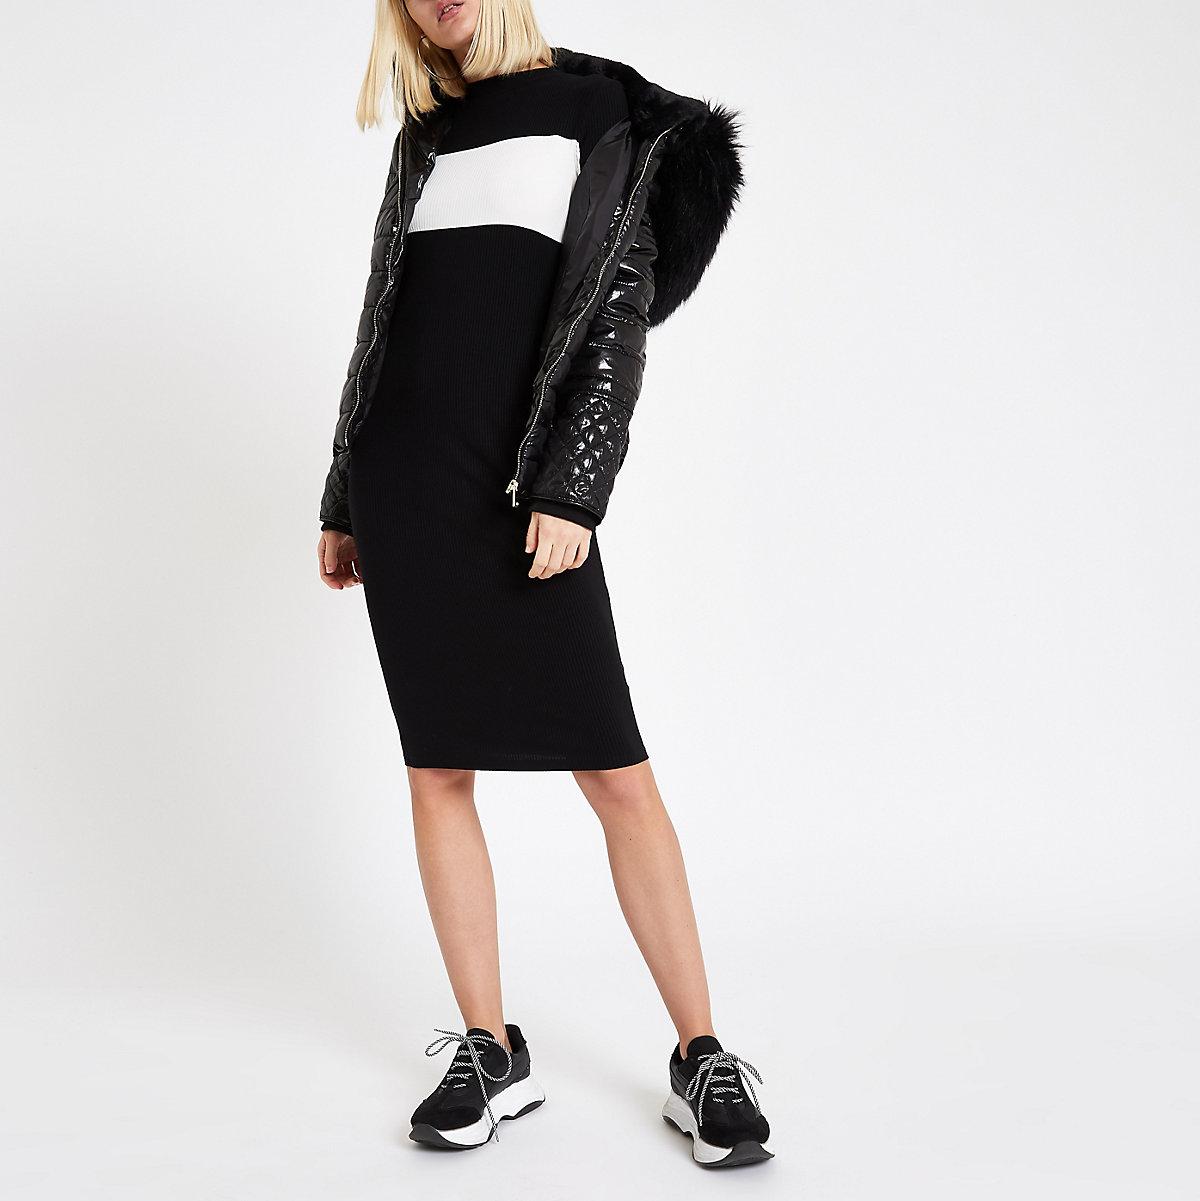 Black color block high neck bodycon dress